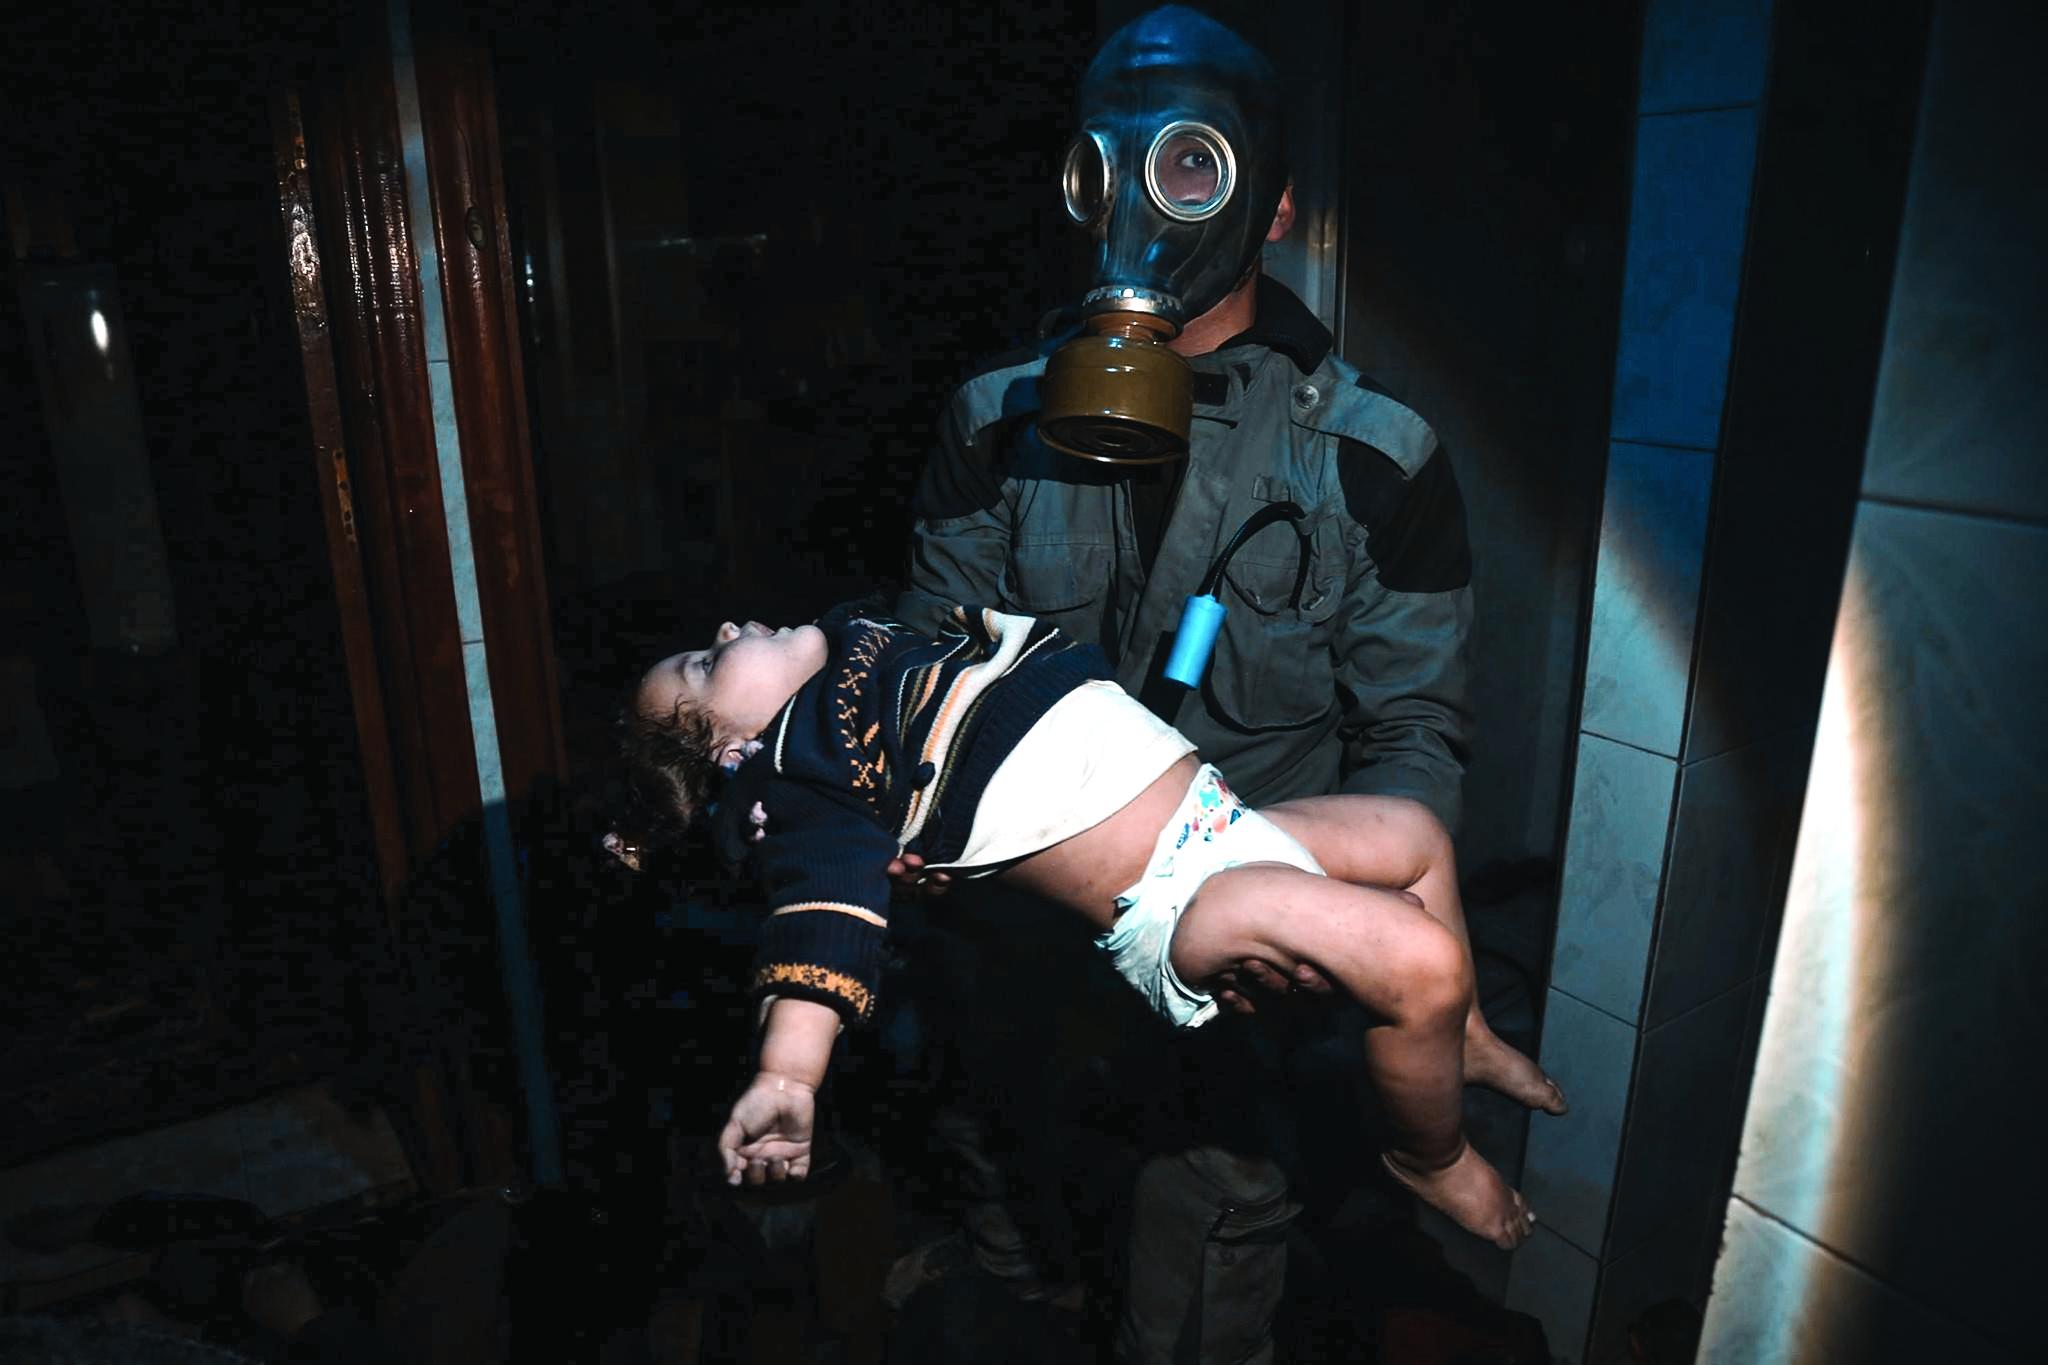 OPAQ anuncia inquérito ao alegado ataque químico na cidade síria de Douma